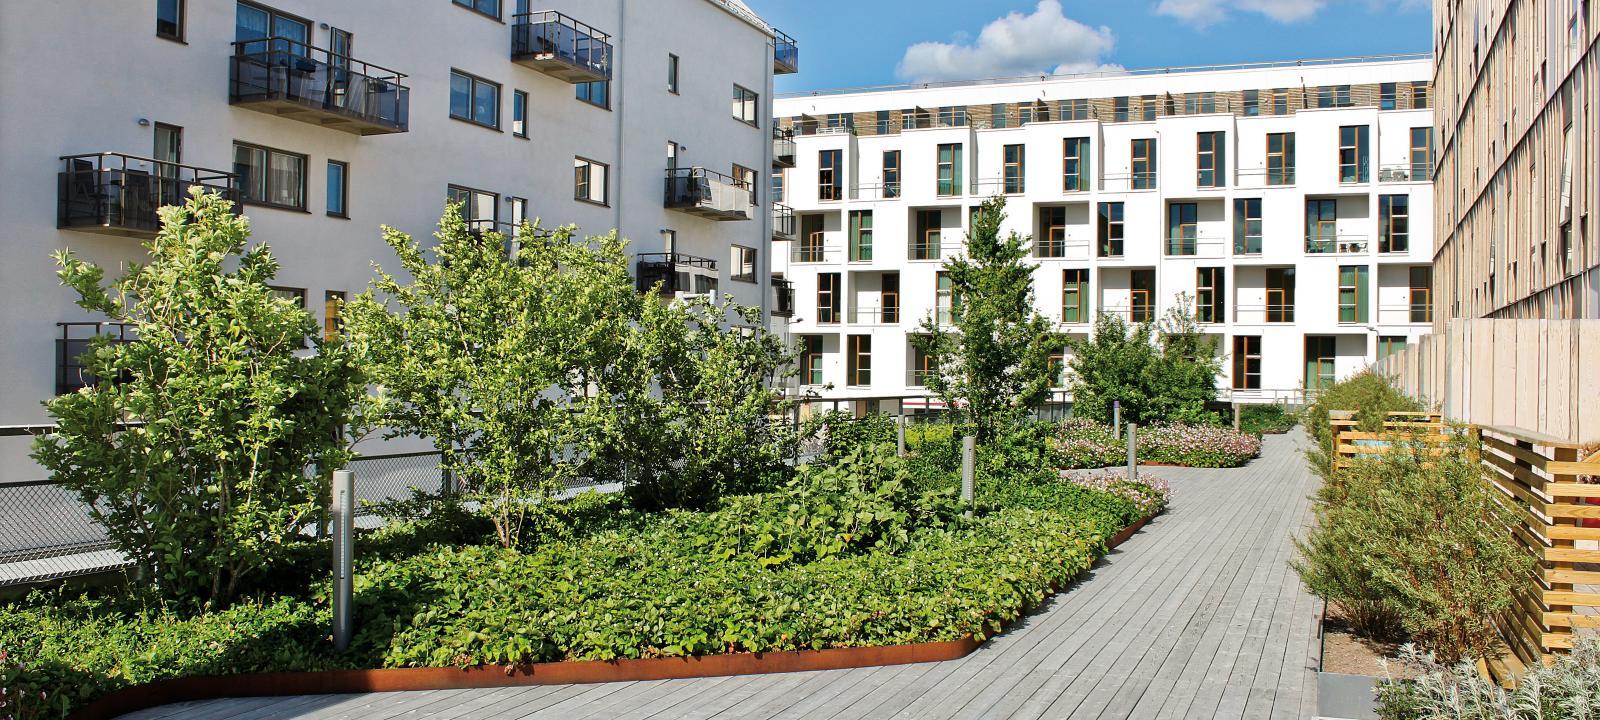 Smaragden Uppsala Rosendal Zinco Green Roof Systems